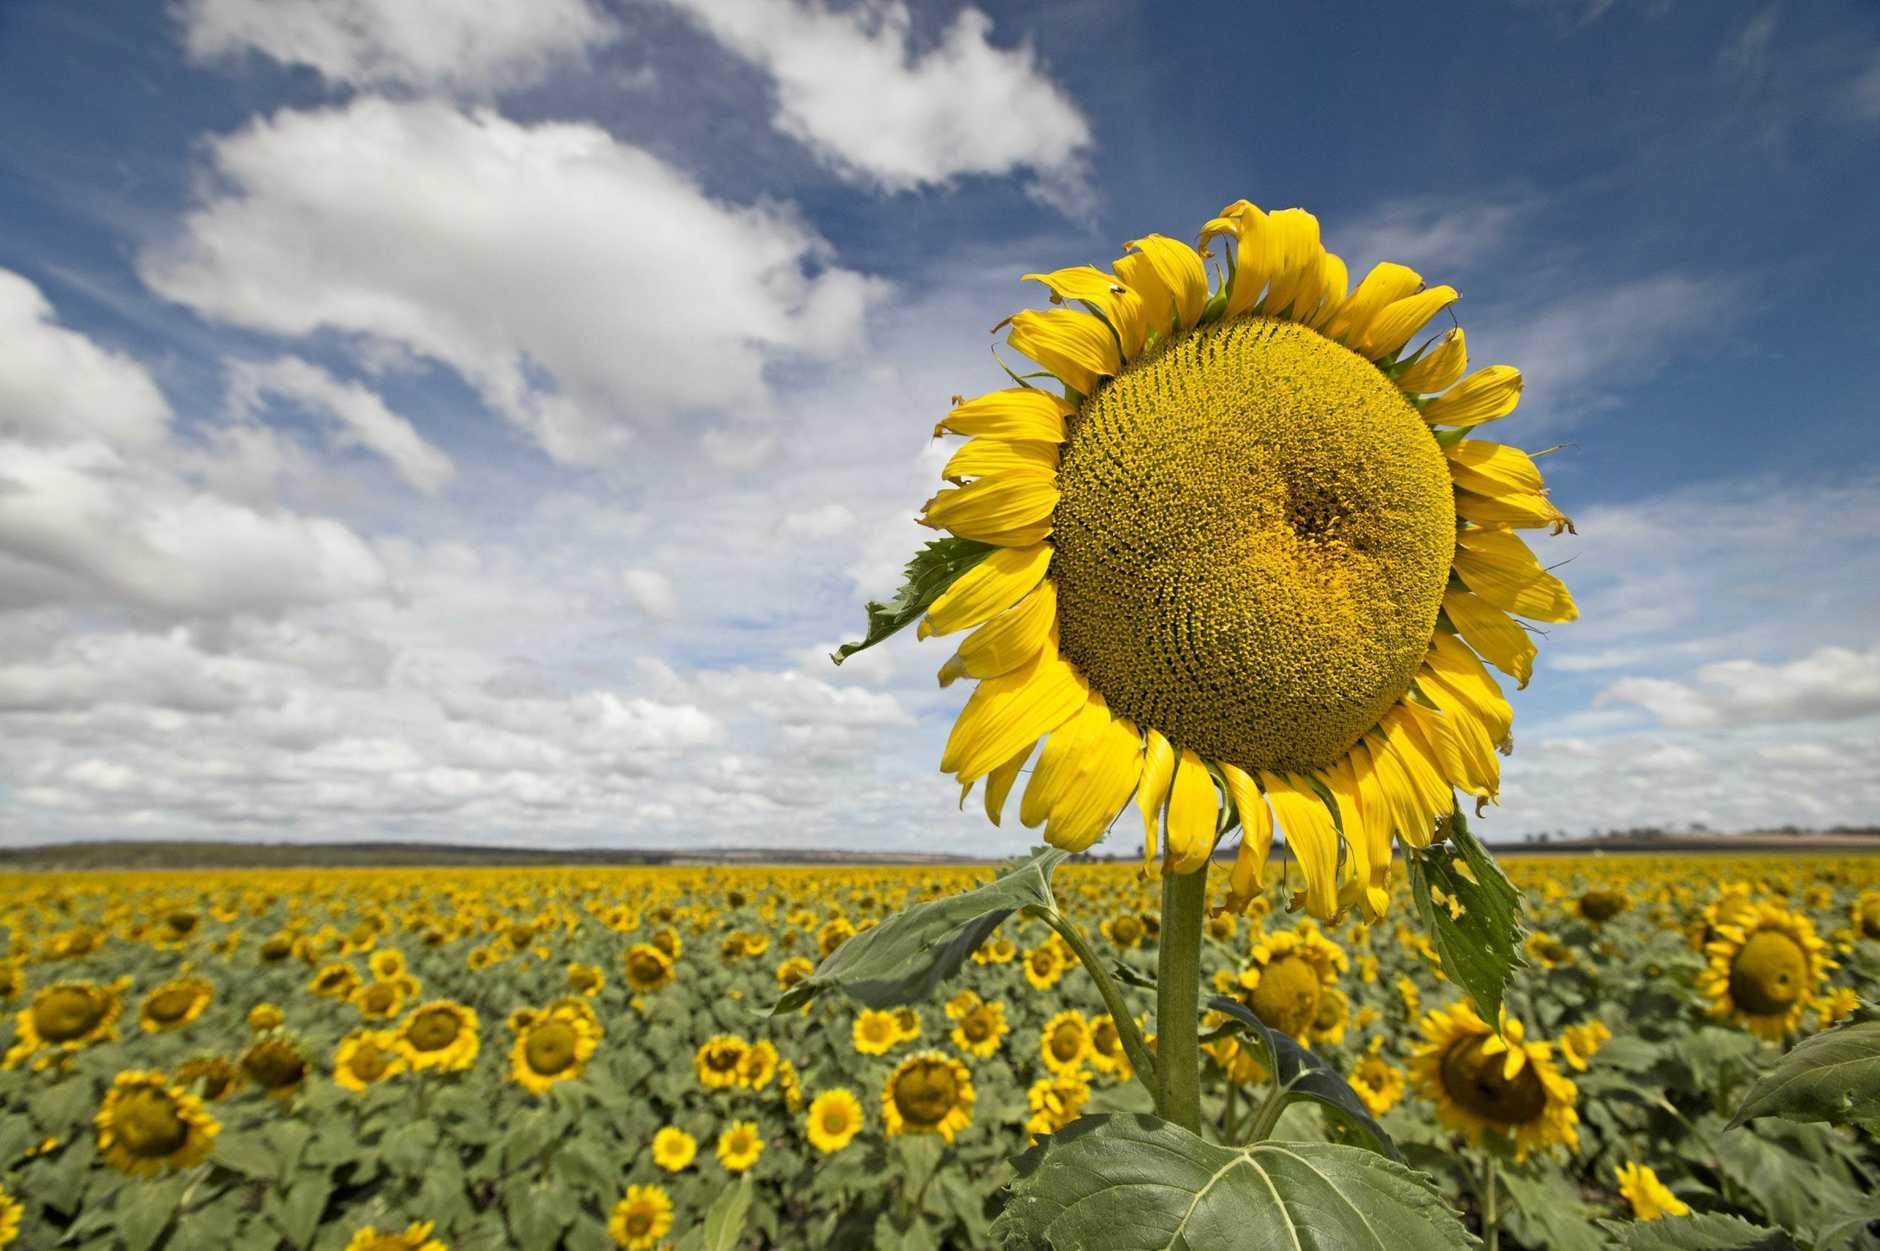 Sunflower field near Clifton, Friday, January 06, 2017.